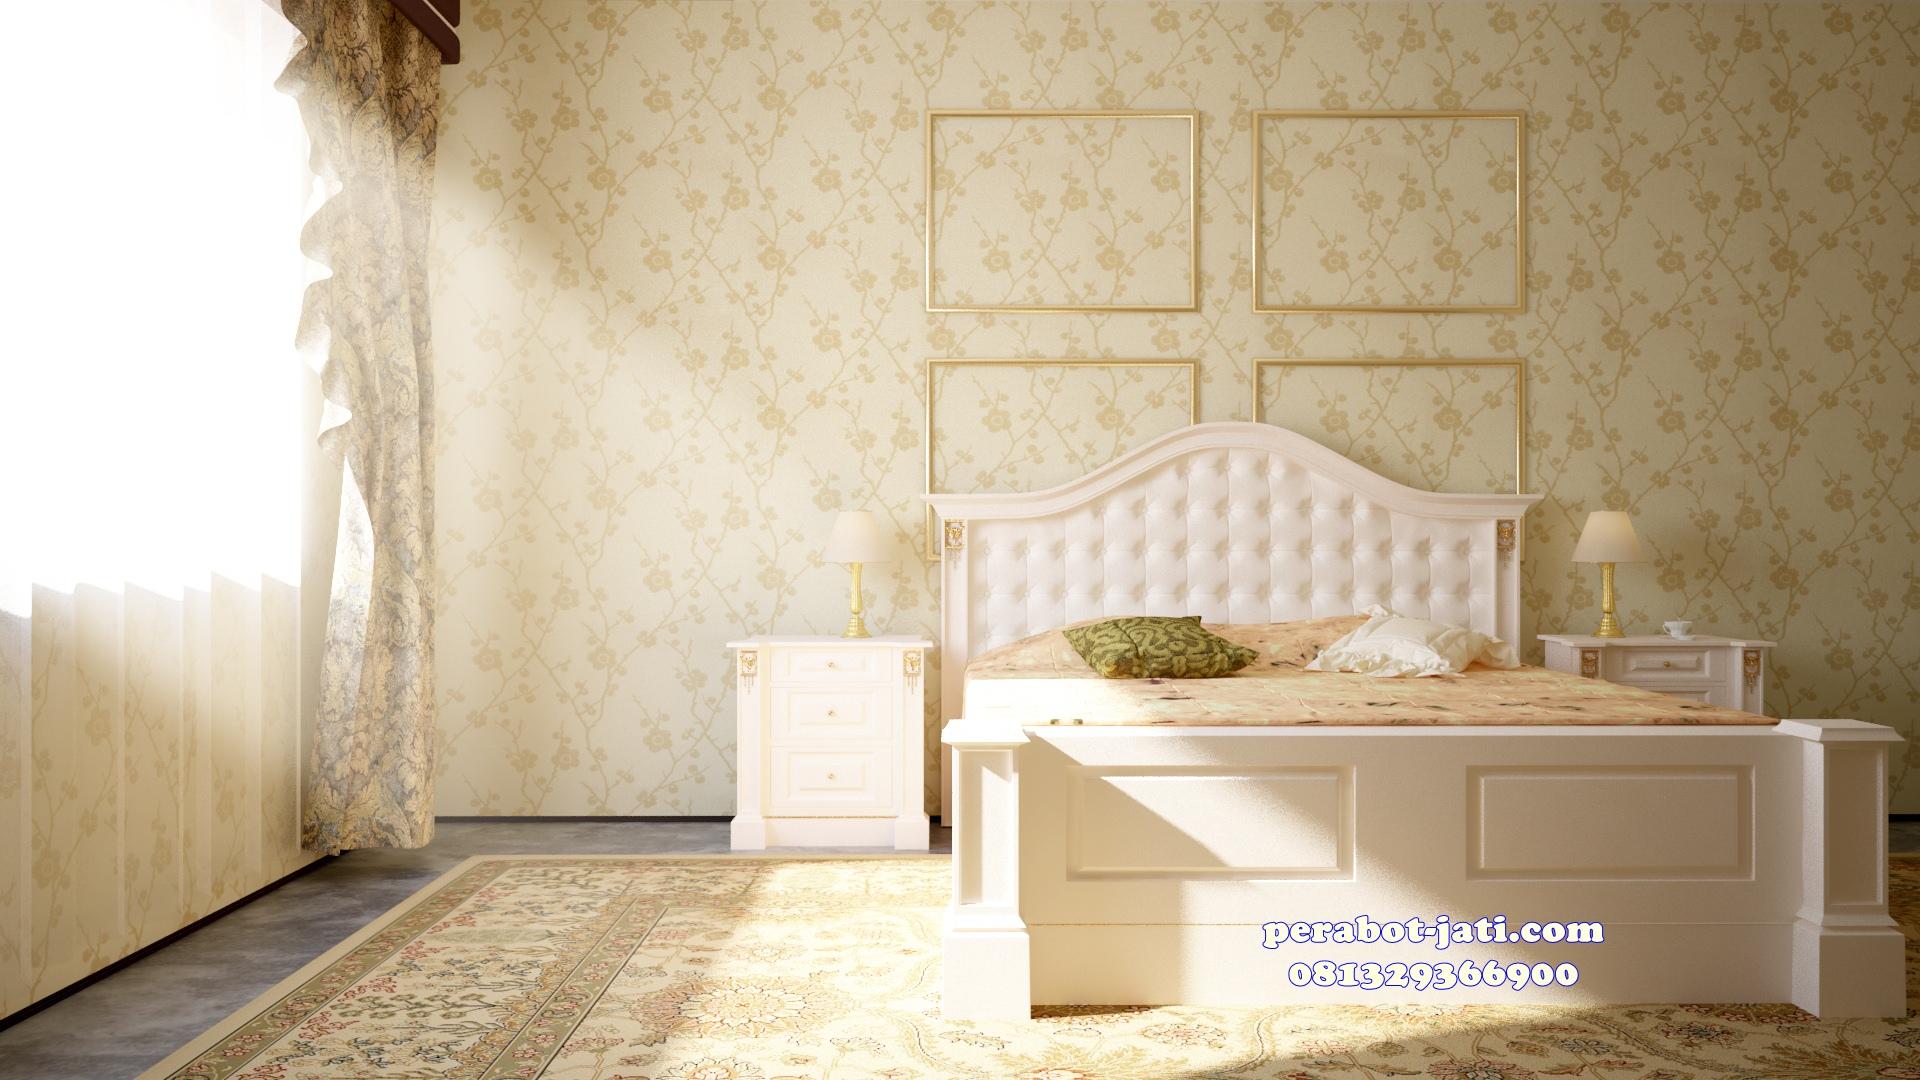 Tempat Tidur Minimalis Mewah Luis Andriano Duco